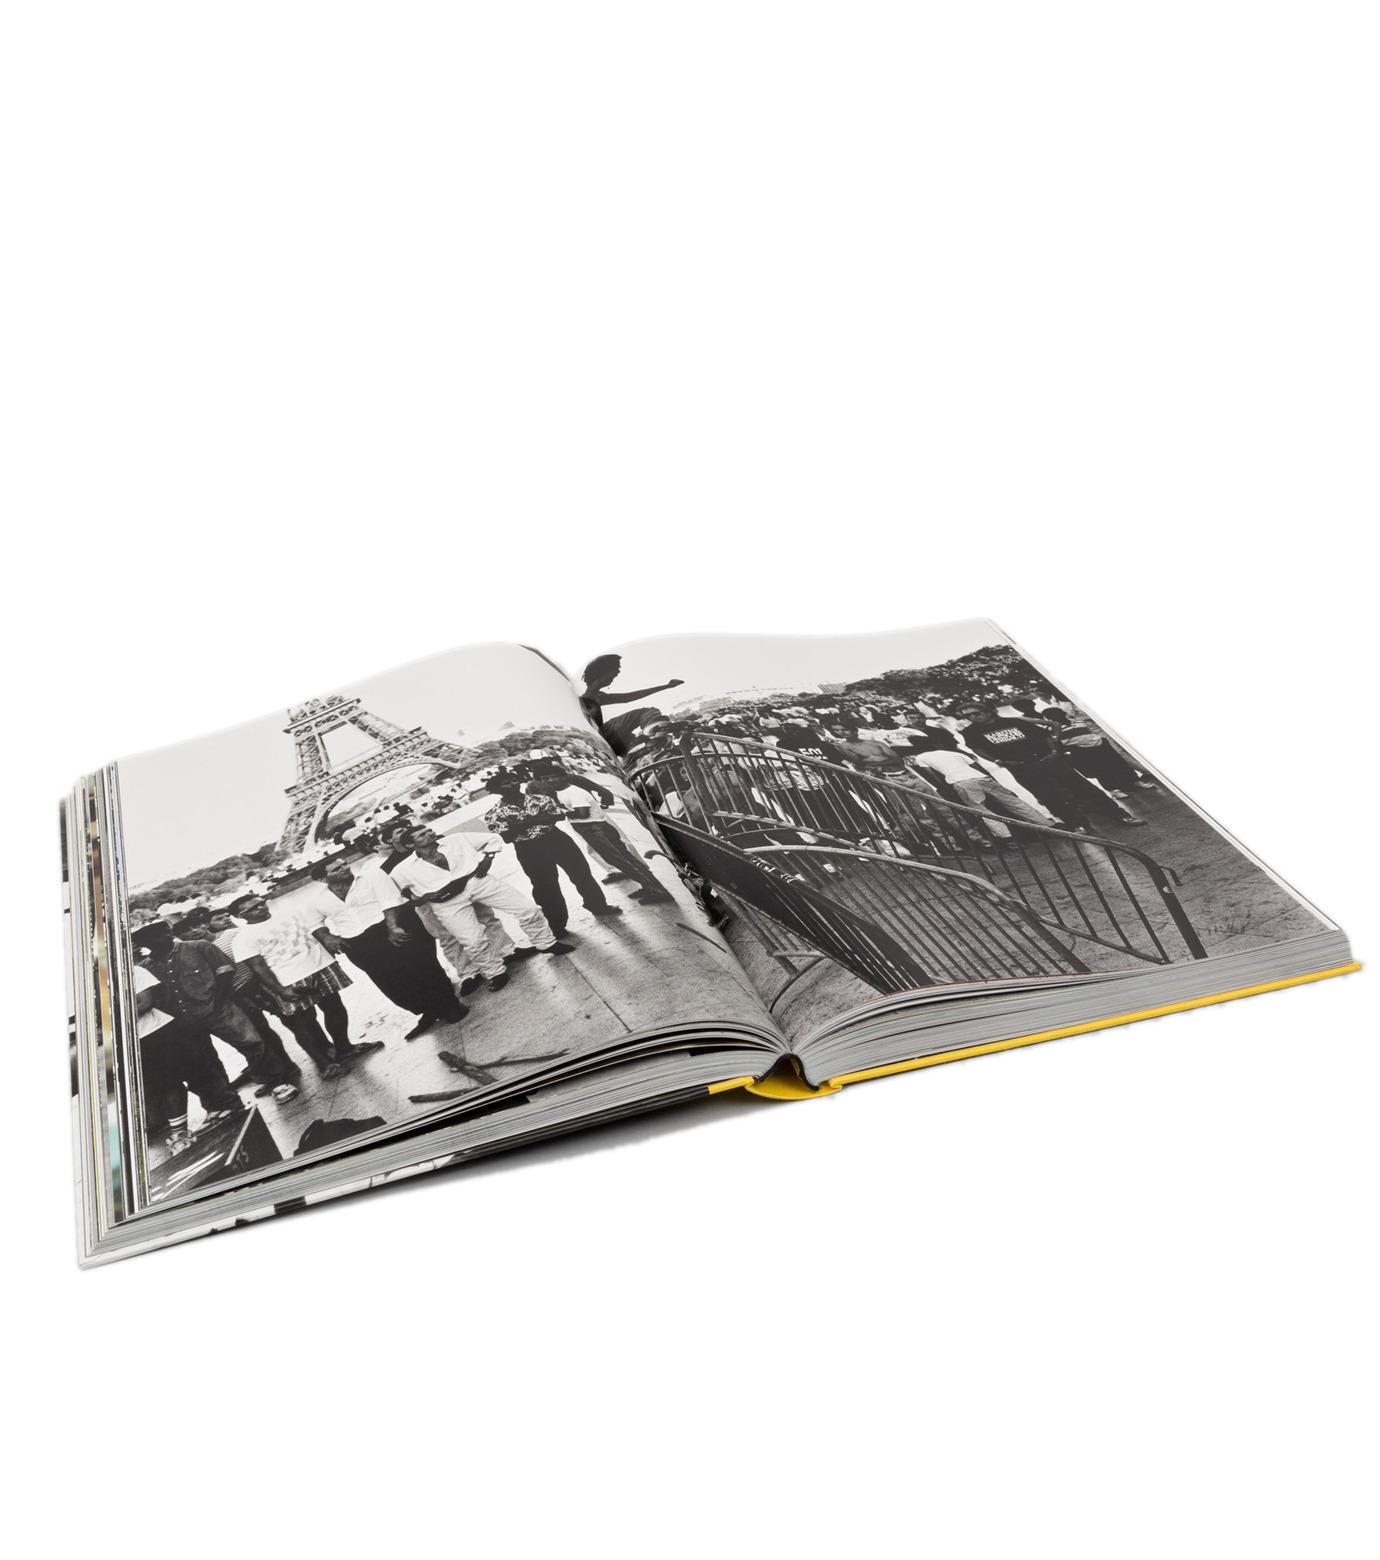 ArtBook(アートブック)のArthur Elgort:The Big Picture.-GRAY(インテリア/OTHER-GOODS/interior/OTHER-GOODS)-86930-543-1-11 拡大詳細画像5